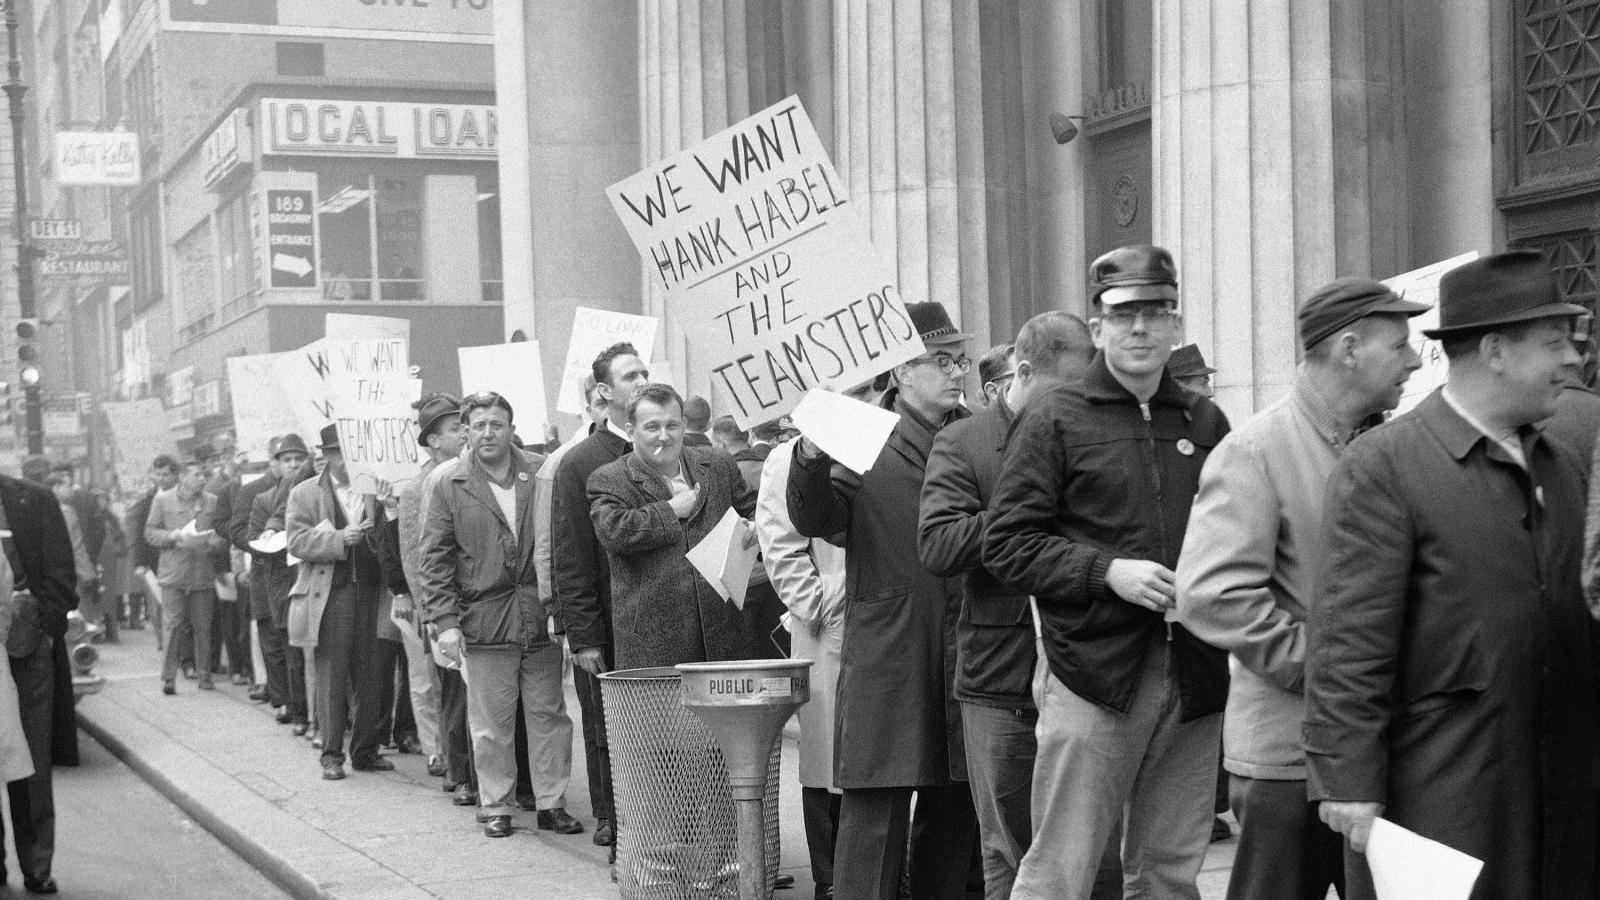 labor-union-protest-ny-e1518636153895.jpeg